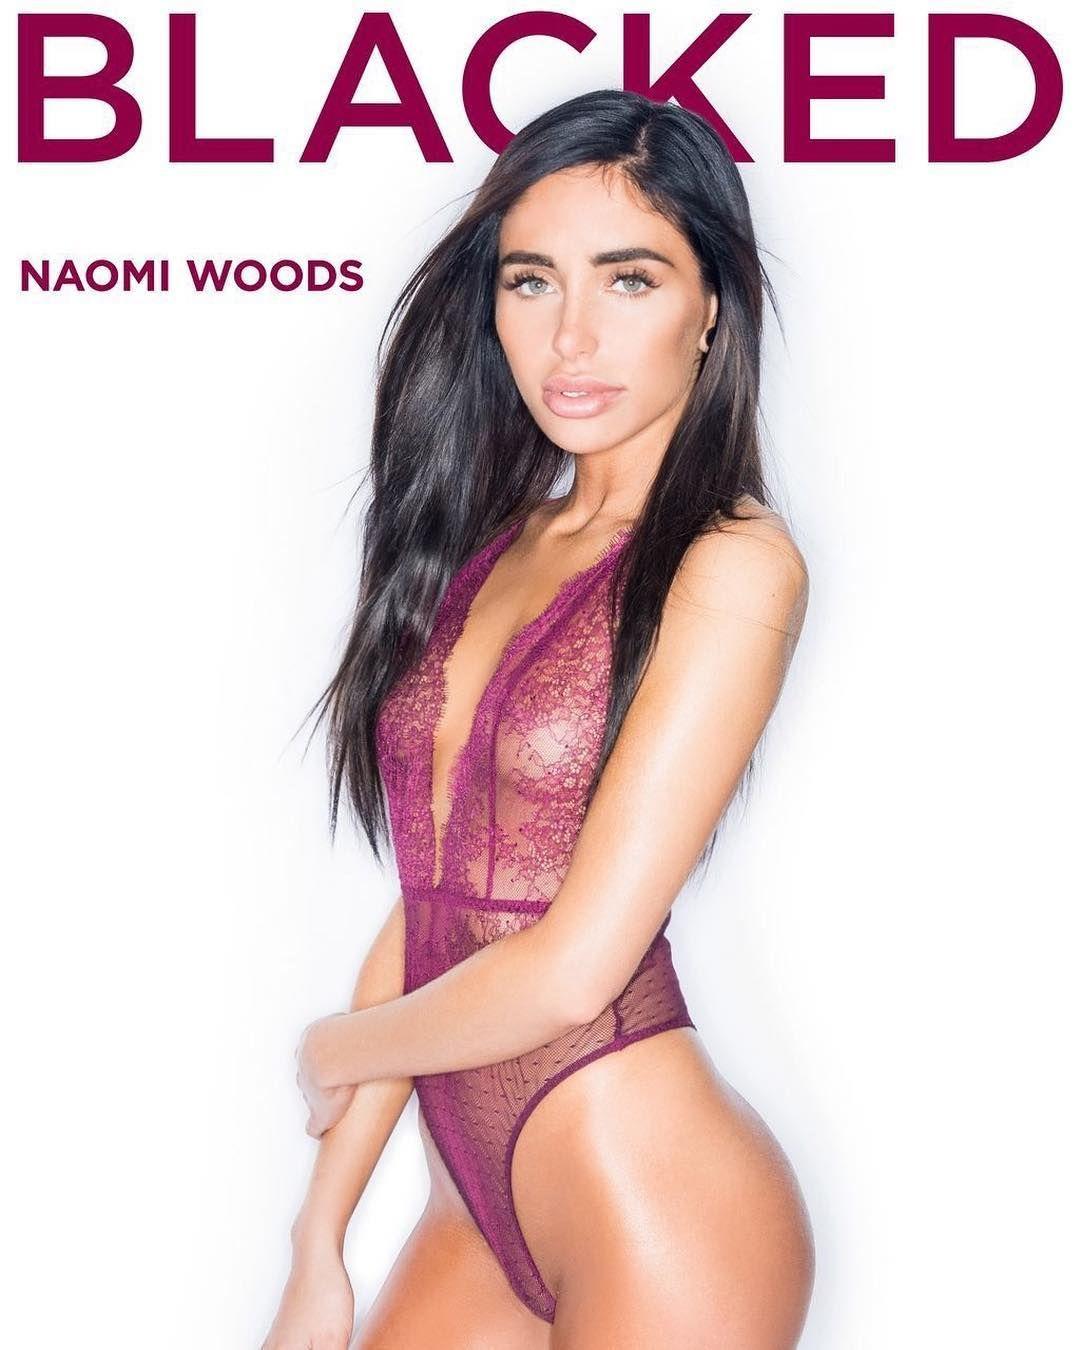 4,576 Likes, 50 Comments - Elissa Alexis Naomi Woods -3641